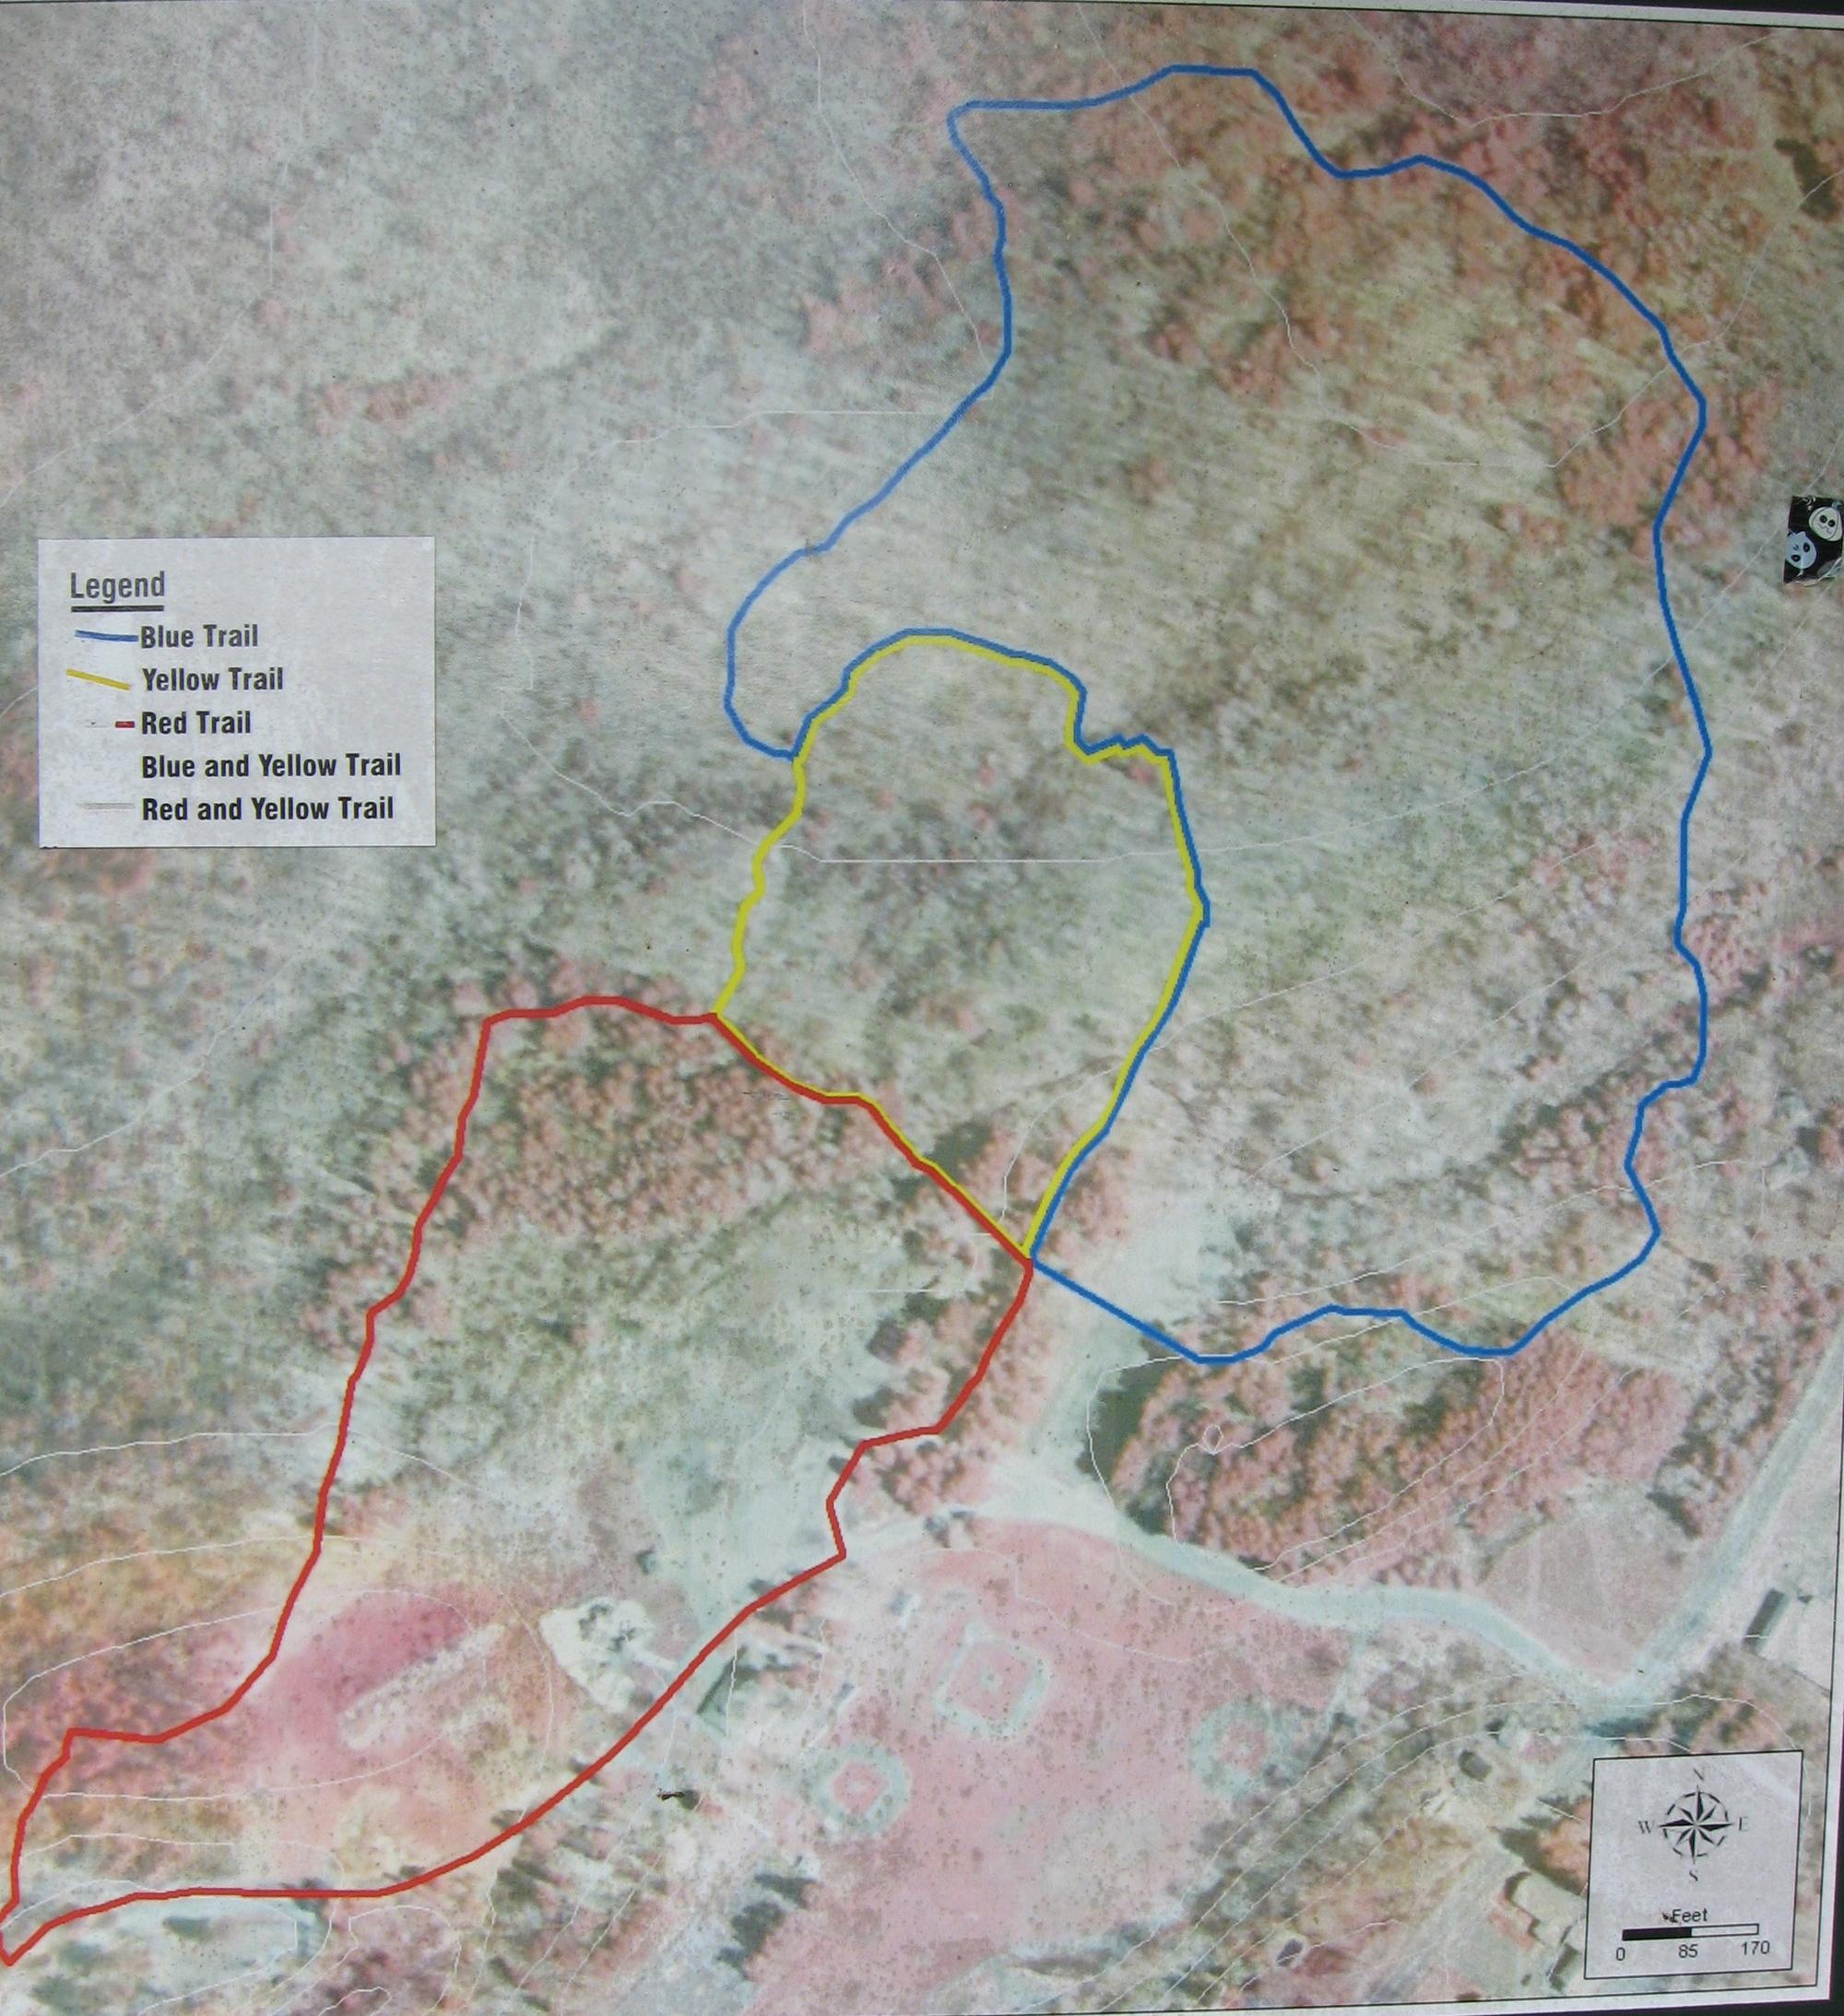 carthageparktrailsmap